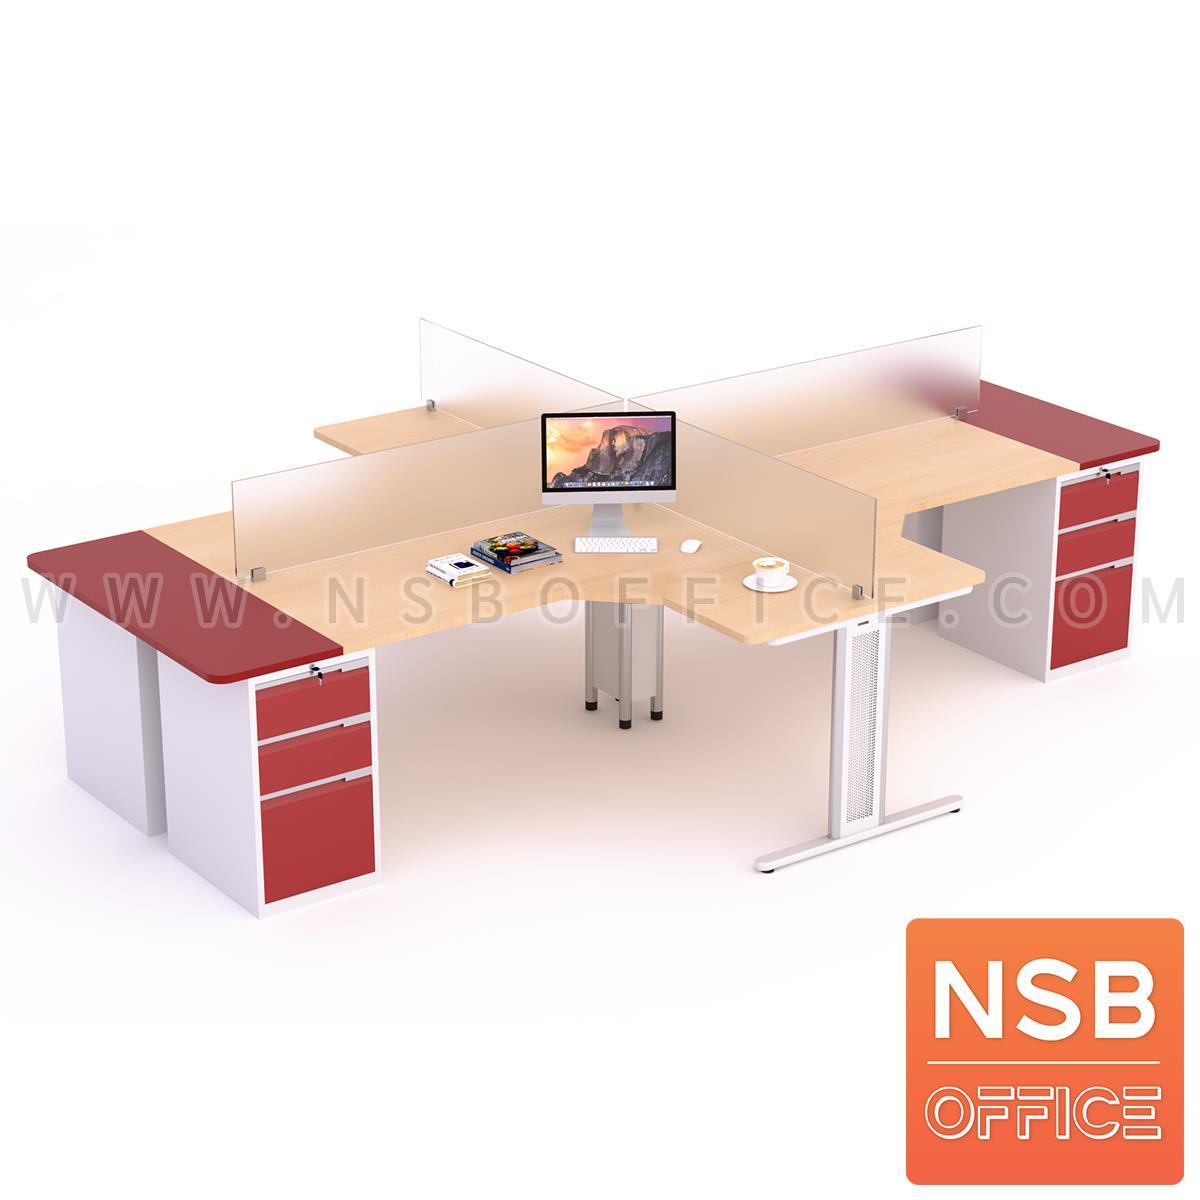 A27A004:ชุดโต๊ะทำงานกลุ่ม 4 ที่นั่ง  รุ่น Bellini (เบลลินีย์) ขนาด 360W cm. พร้อมมินิสกรีนกระจกและตู้ 3 ลิ้นชักเหล็ก